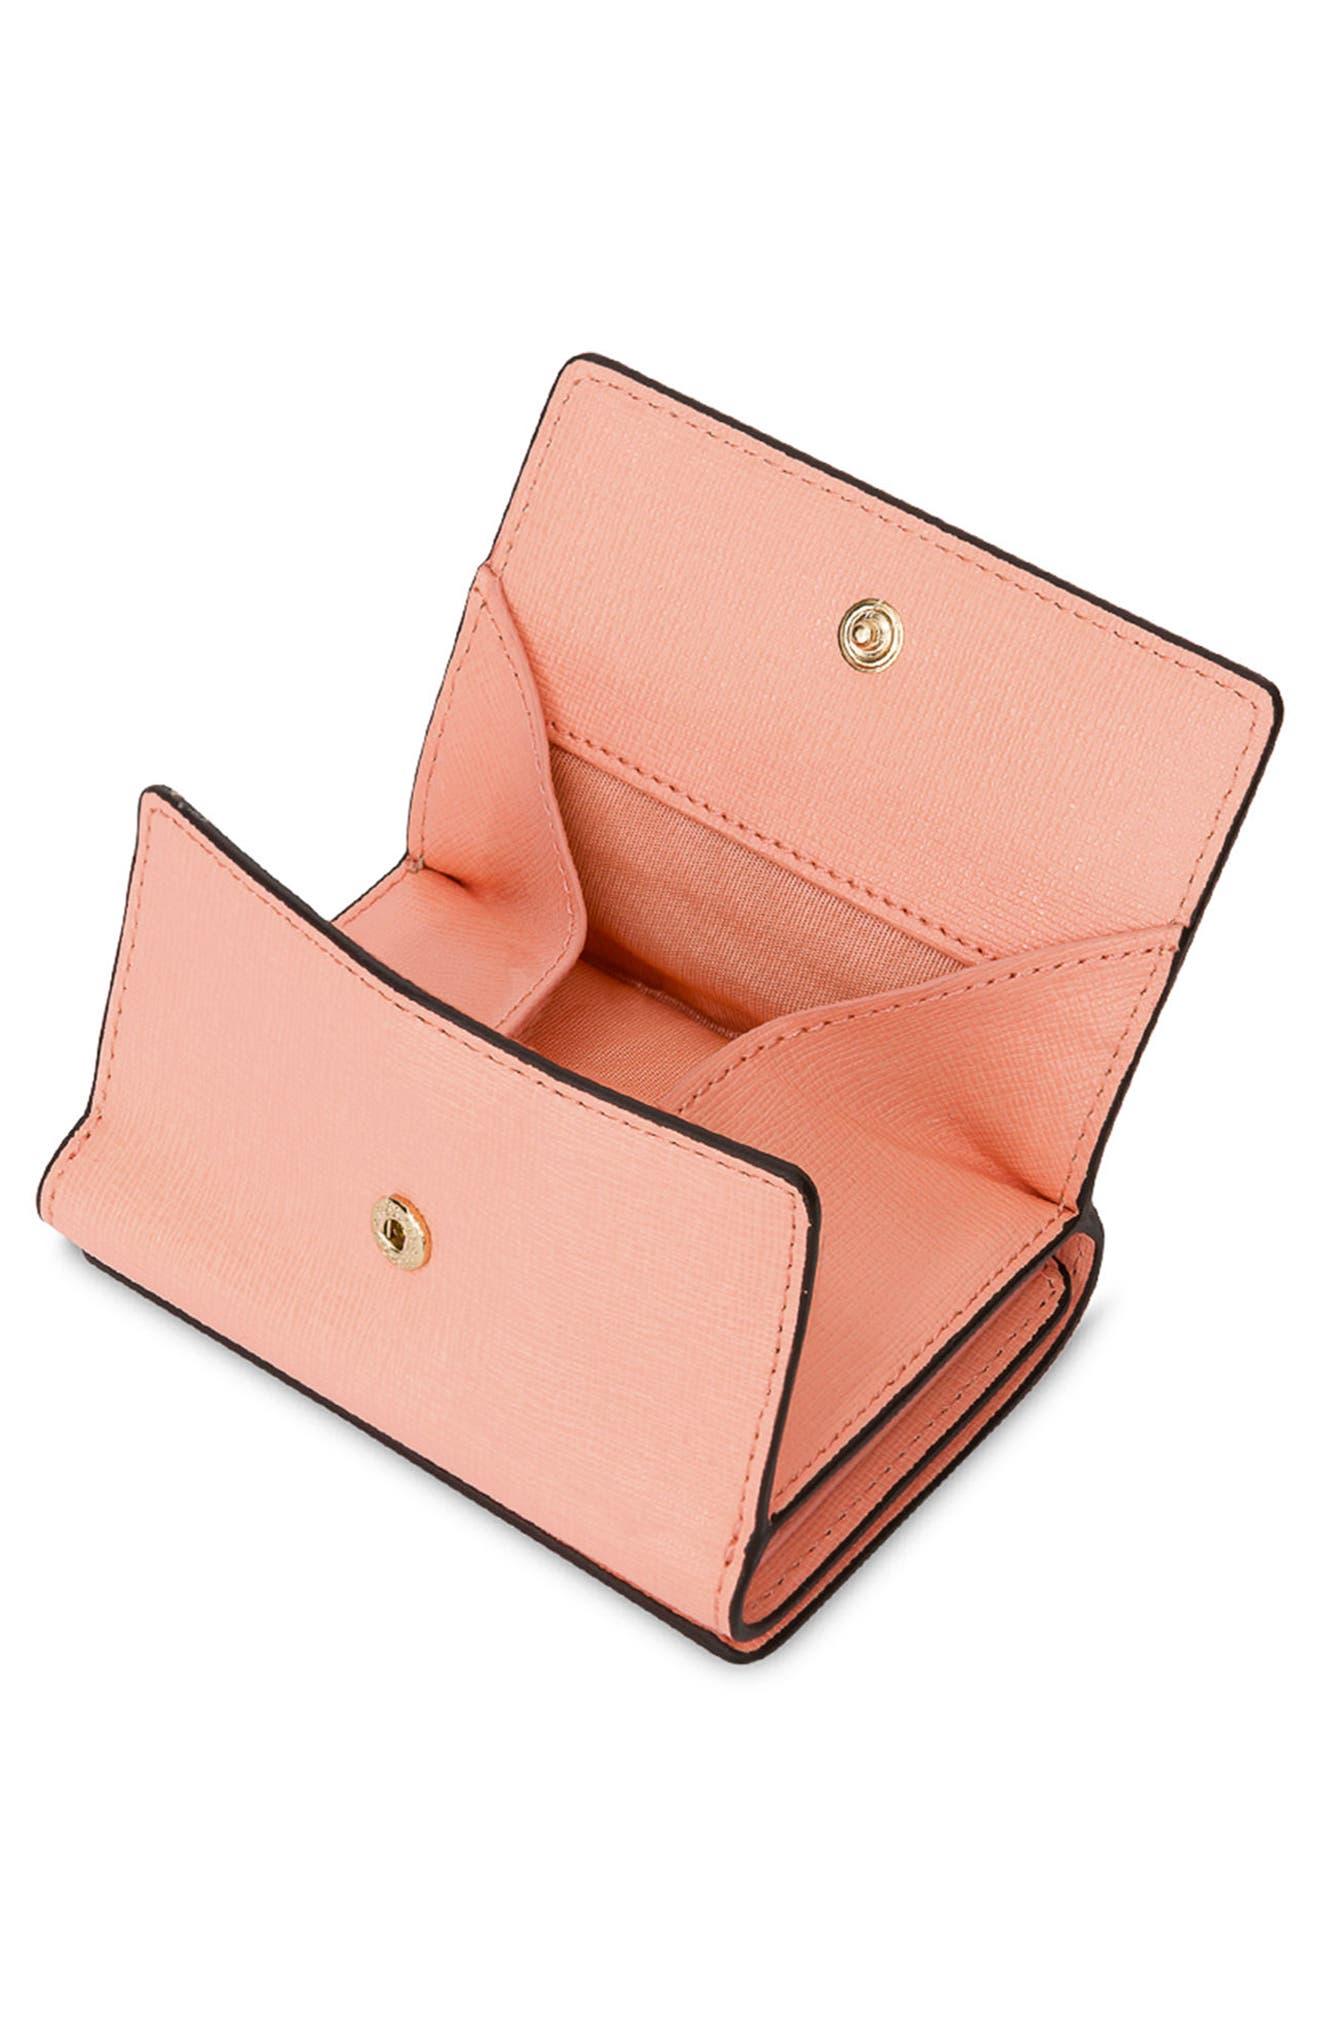 Babylon Saffiano Leather Trifold Wallet,                             Alternate thumbnail 4, color,